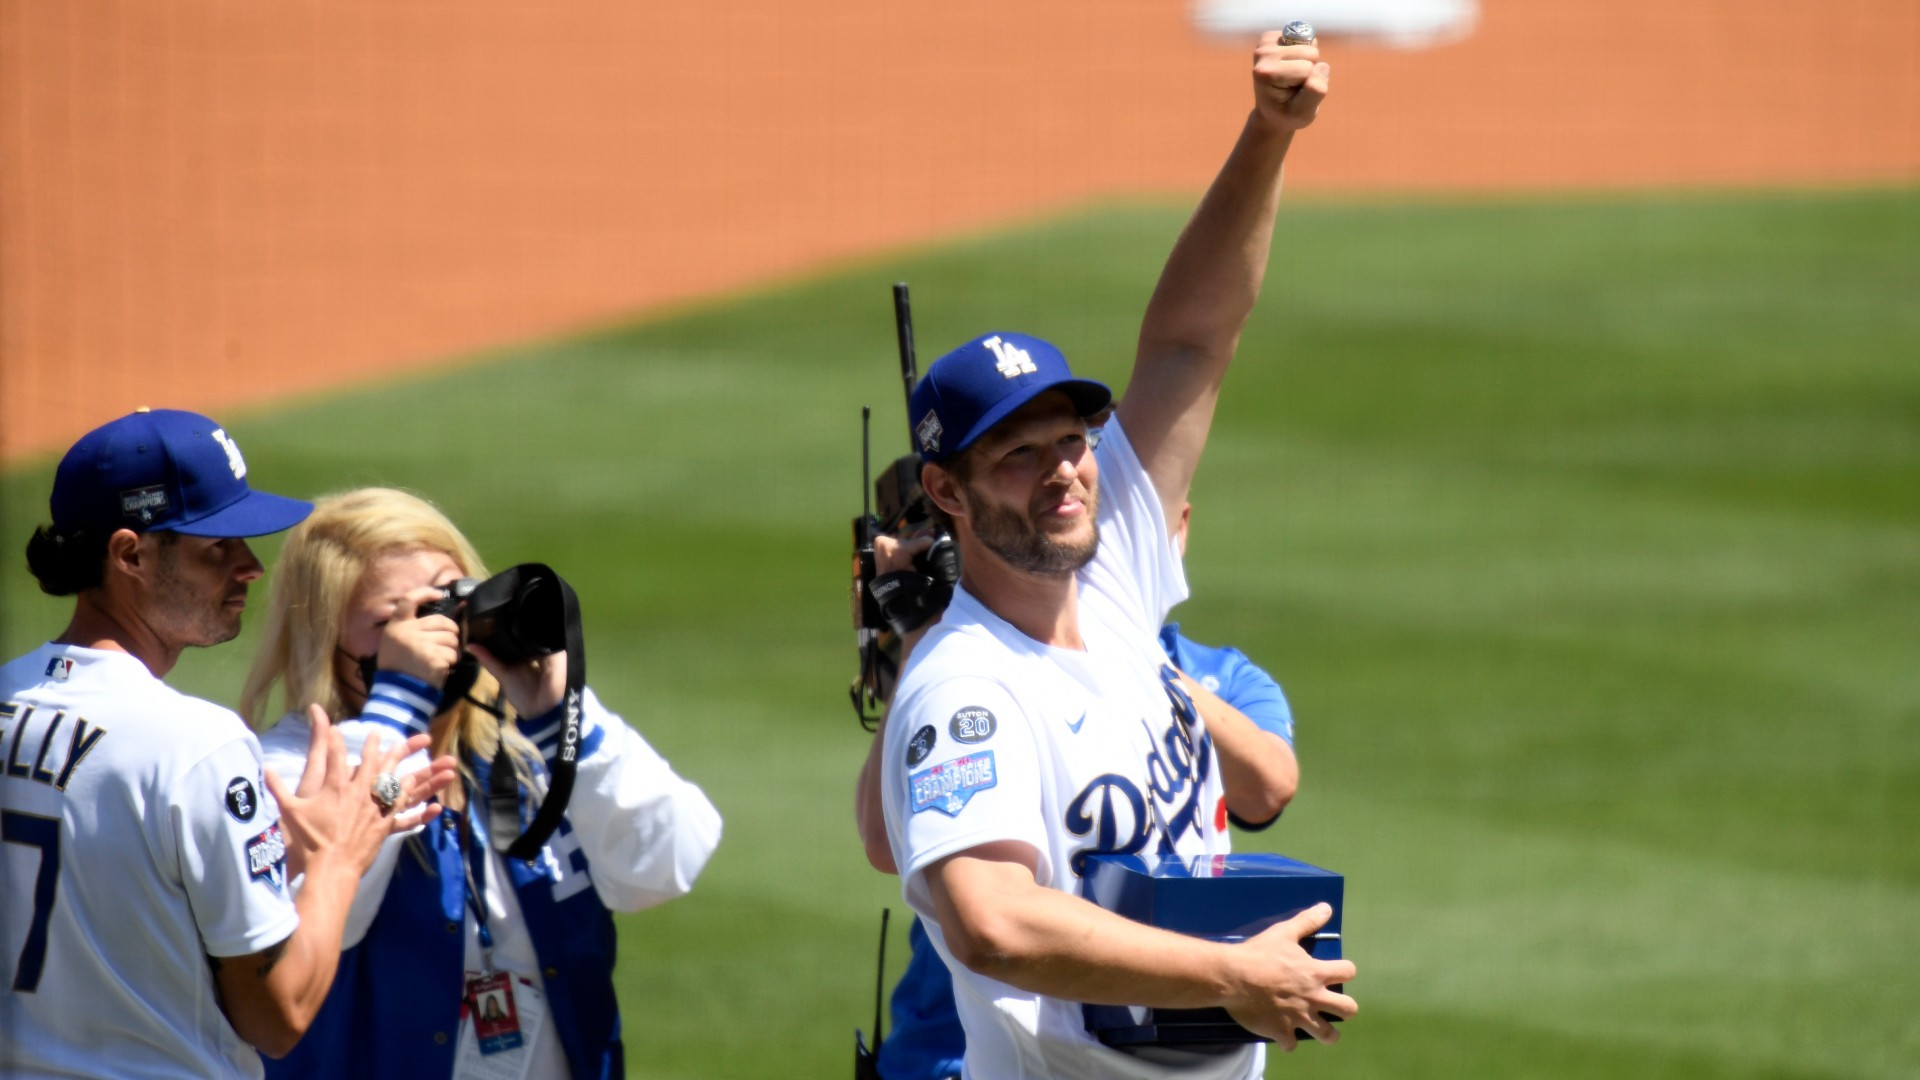 At the Dodgers' ring ceremony, Bronson Arroyo praises Walker Buehler for singing 'Wonderwall'